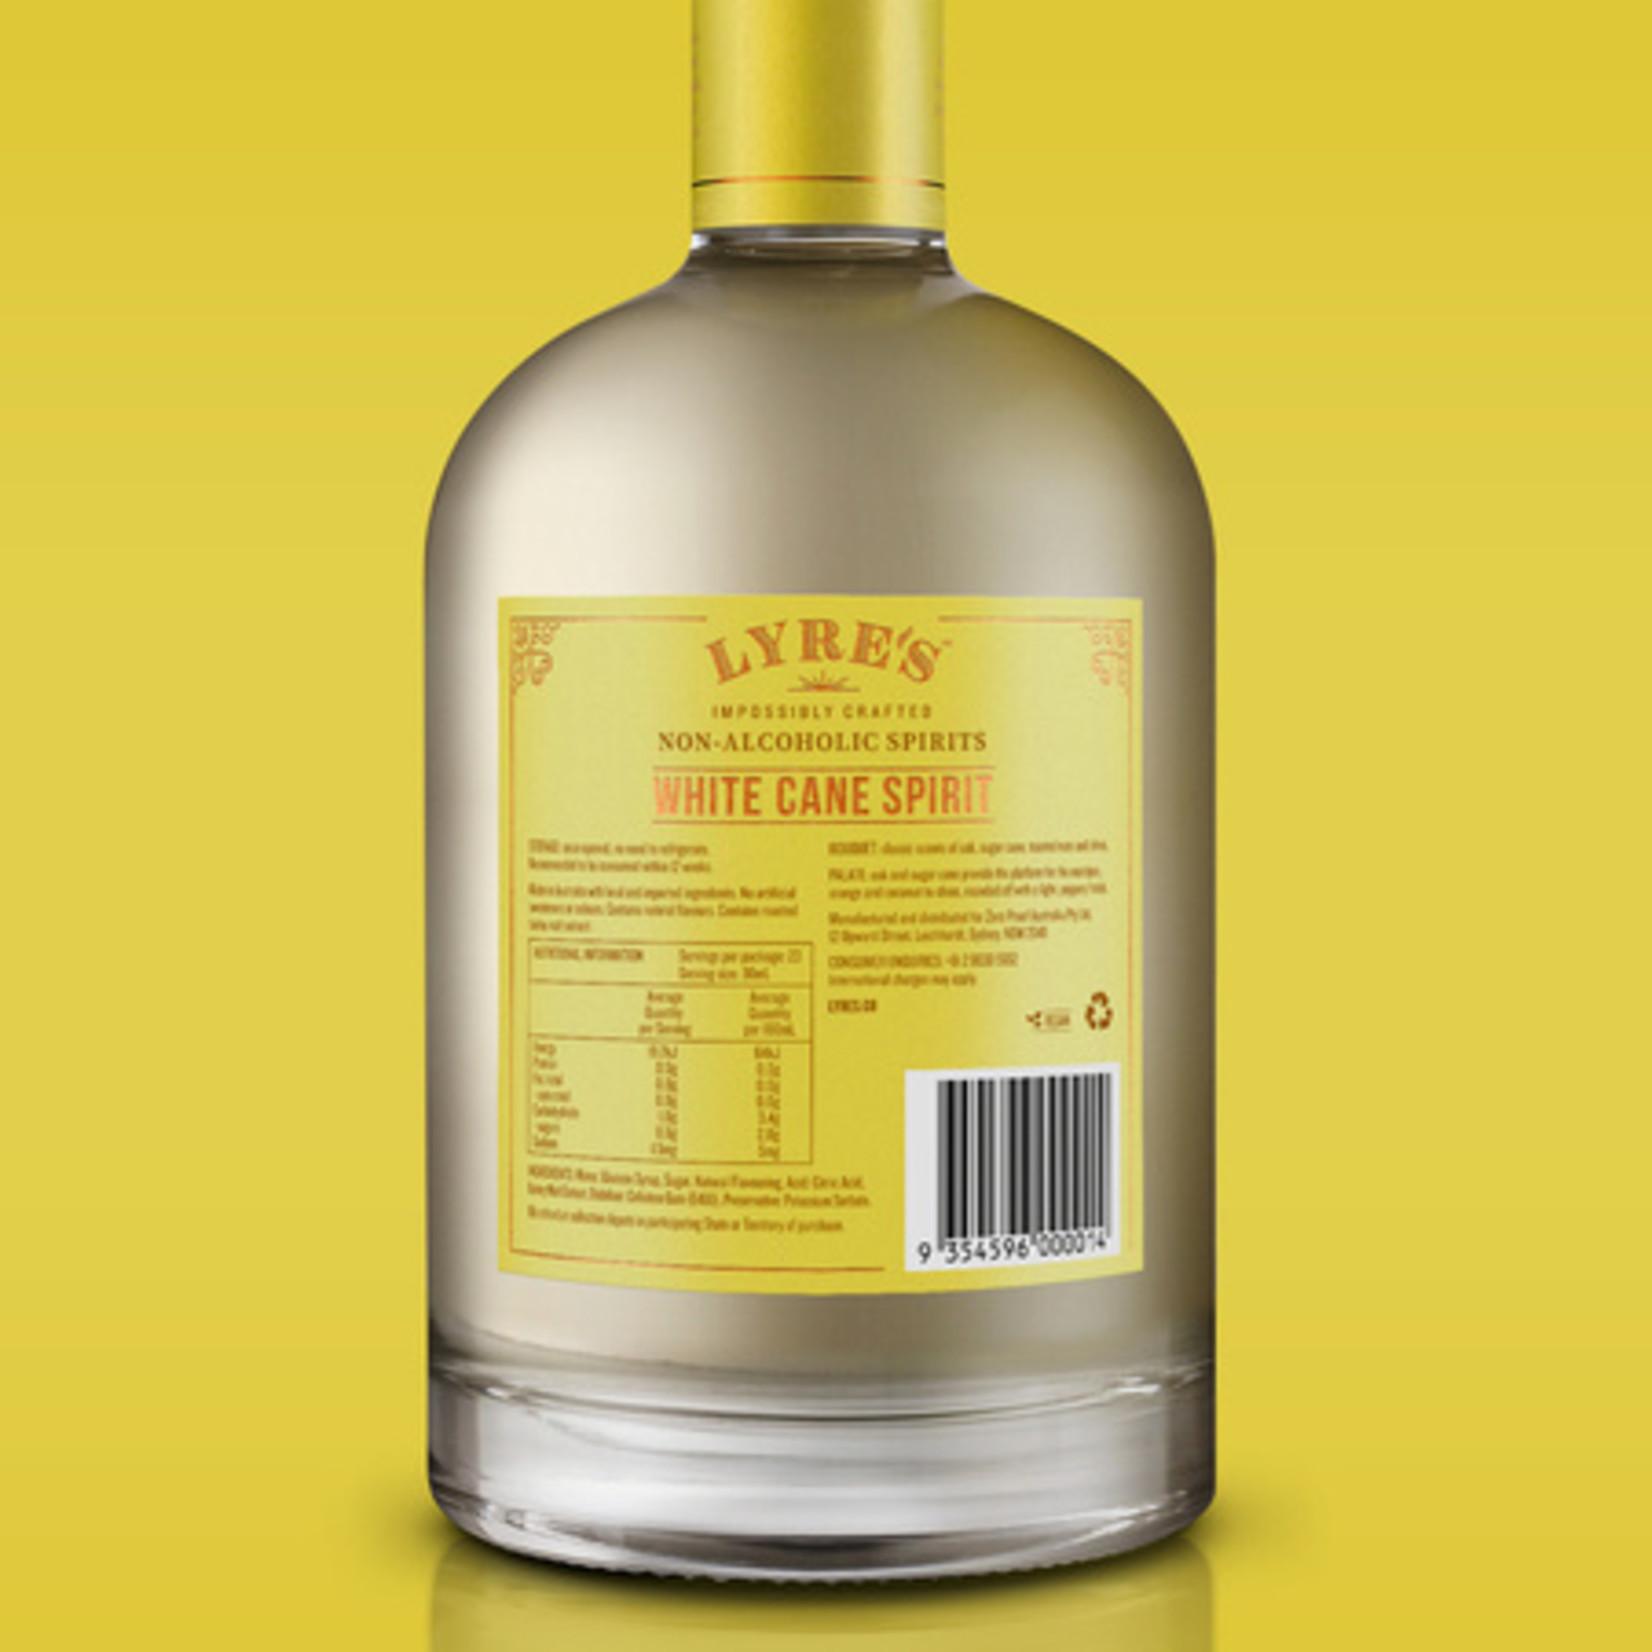 Lyre's Lyre's White Cane Spirit